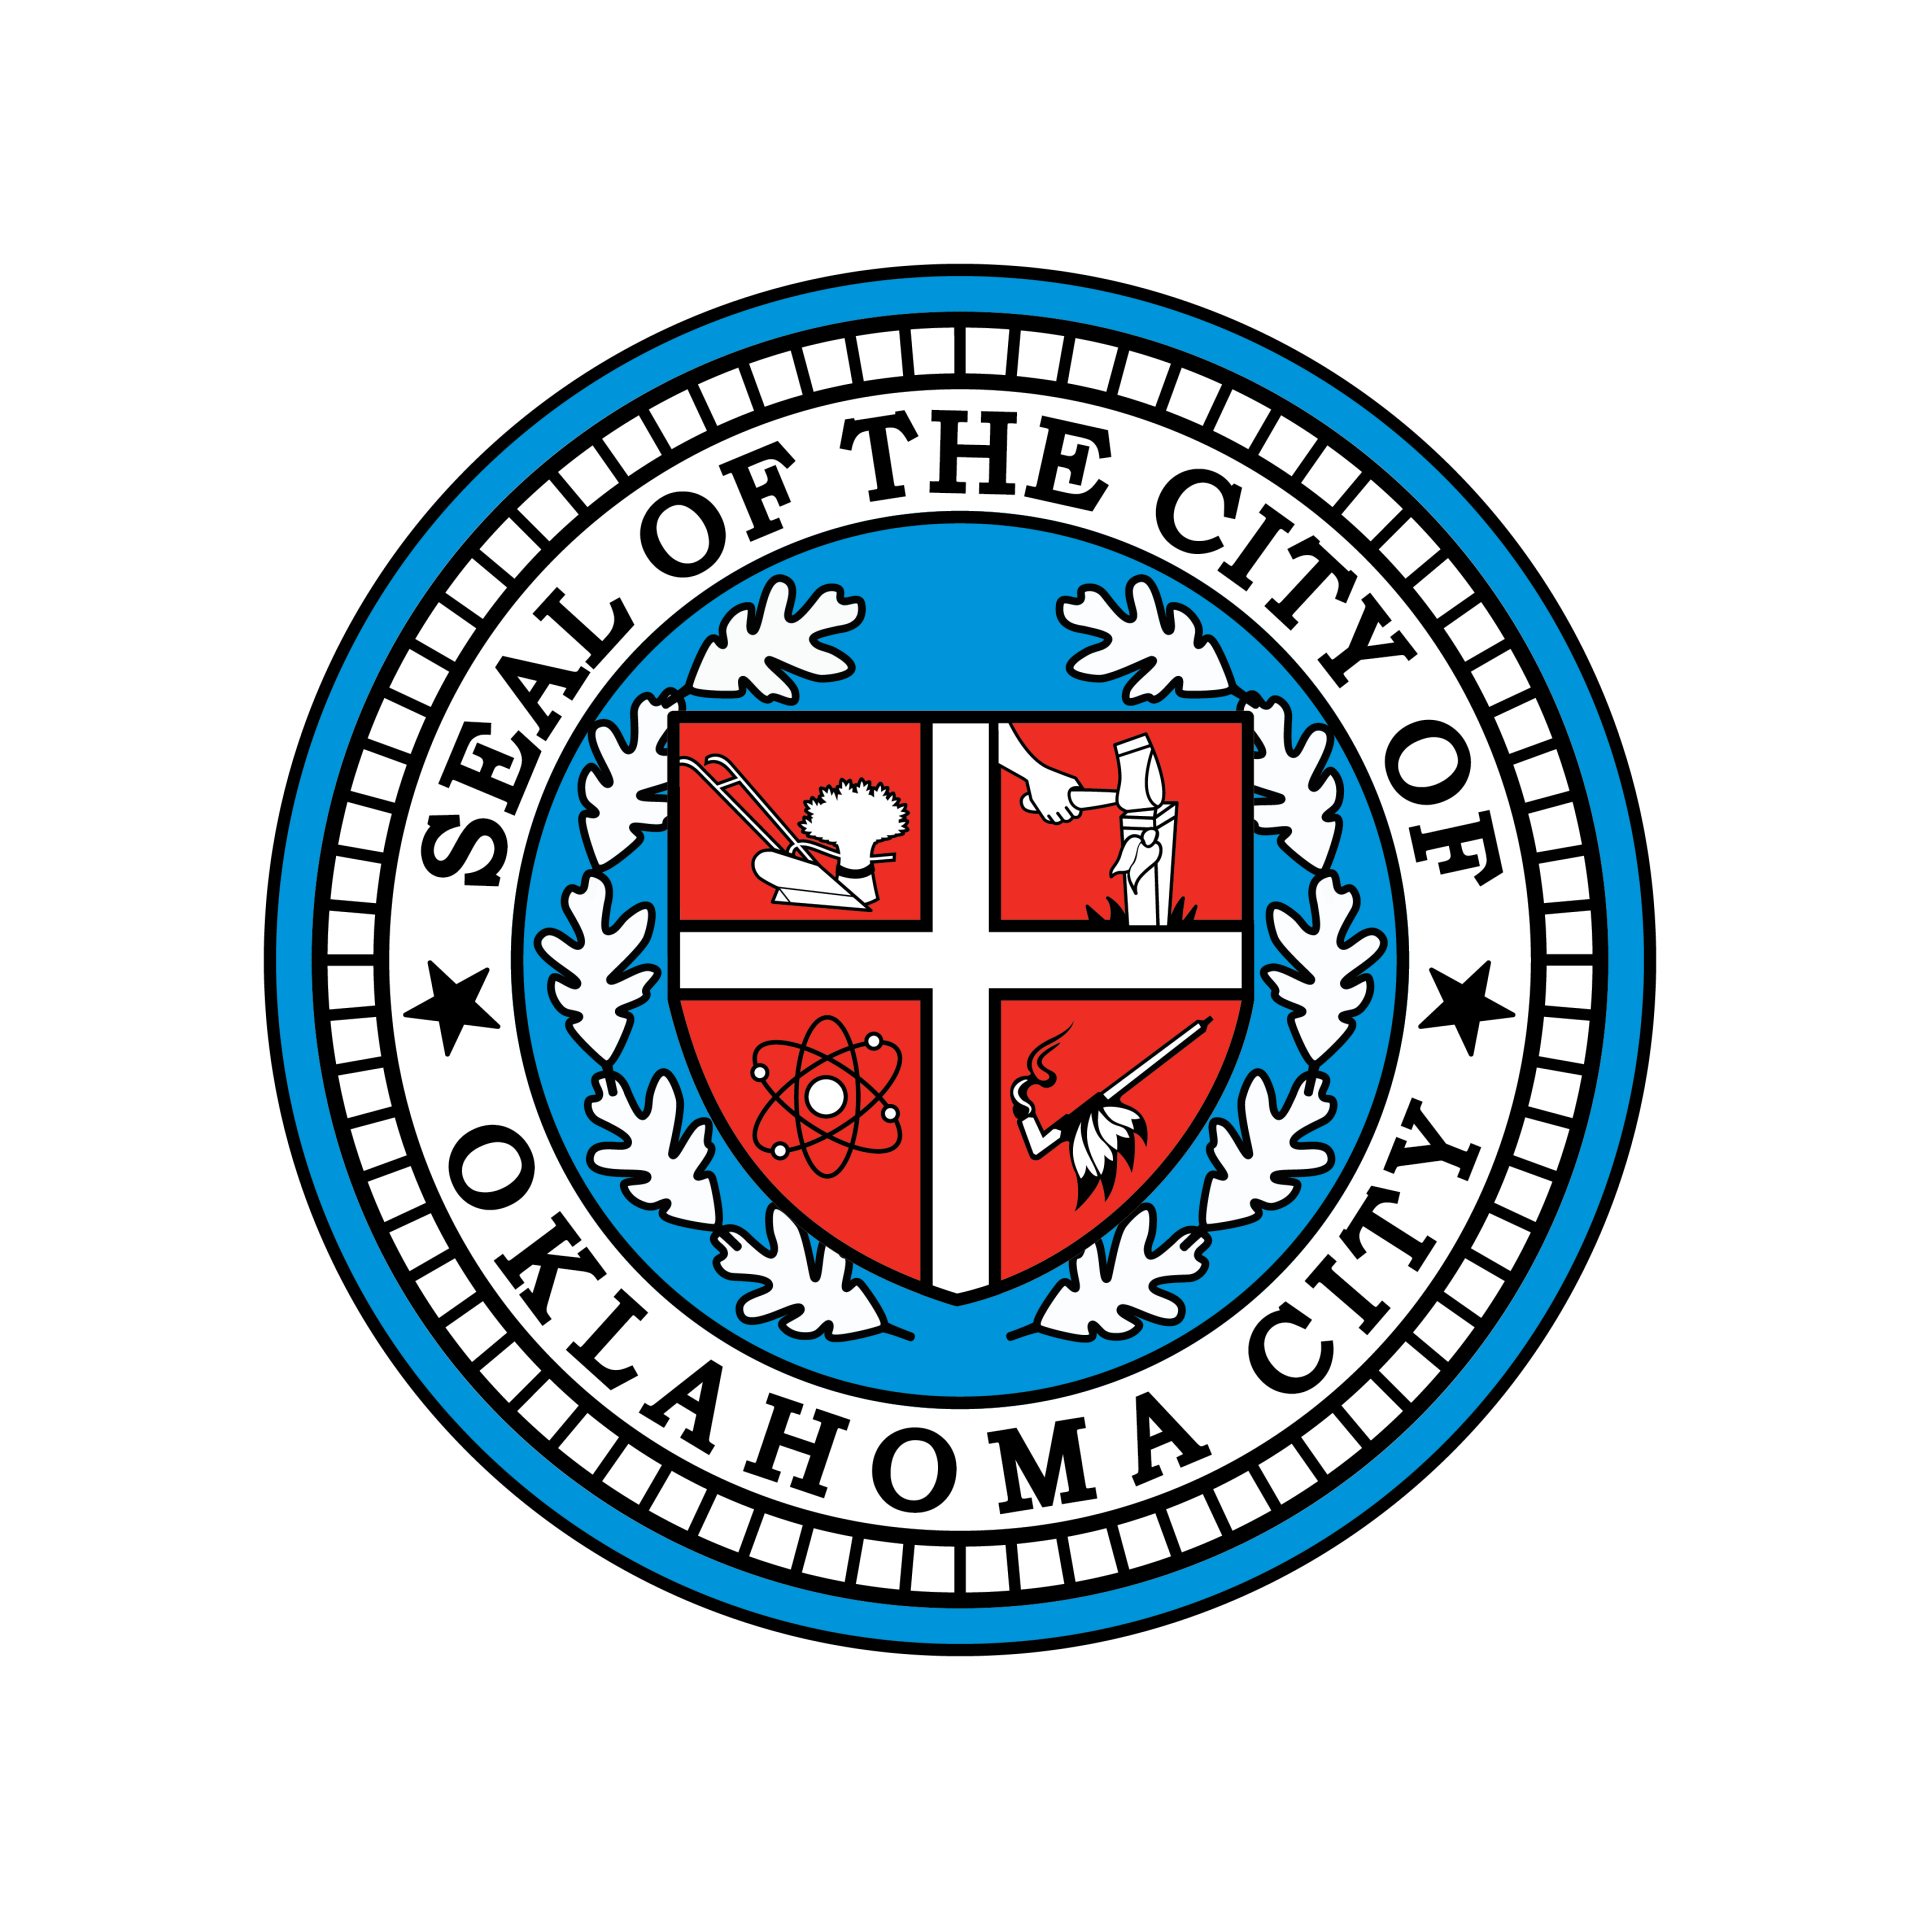 Oklahoma City Sales Tax >> Better Streets Safer City News City Of Okc